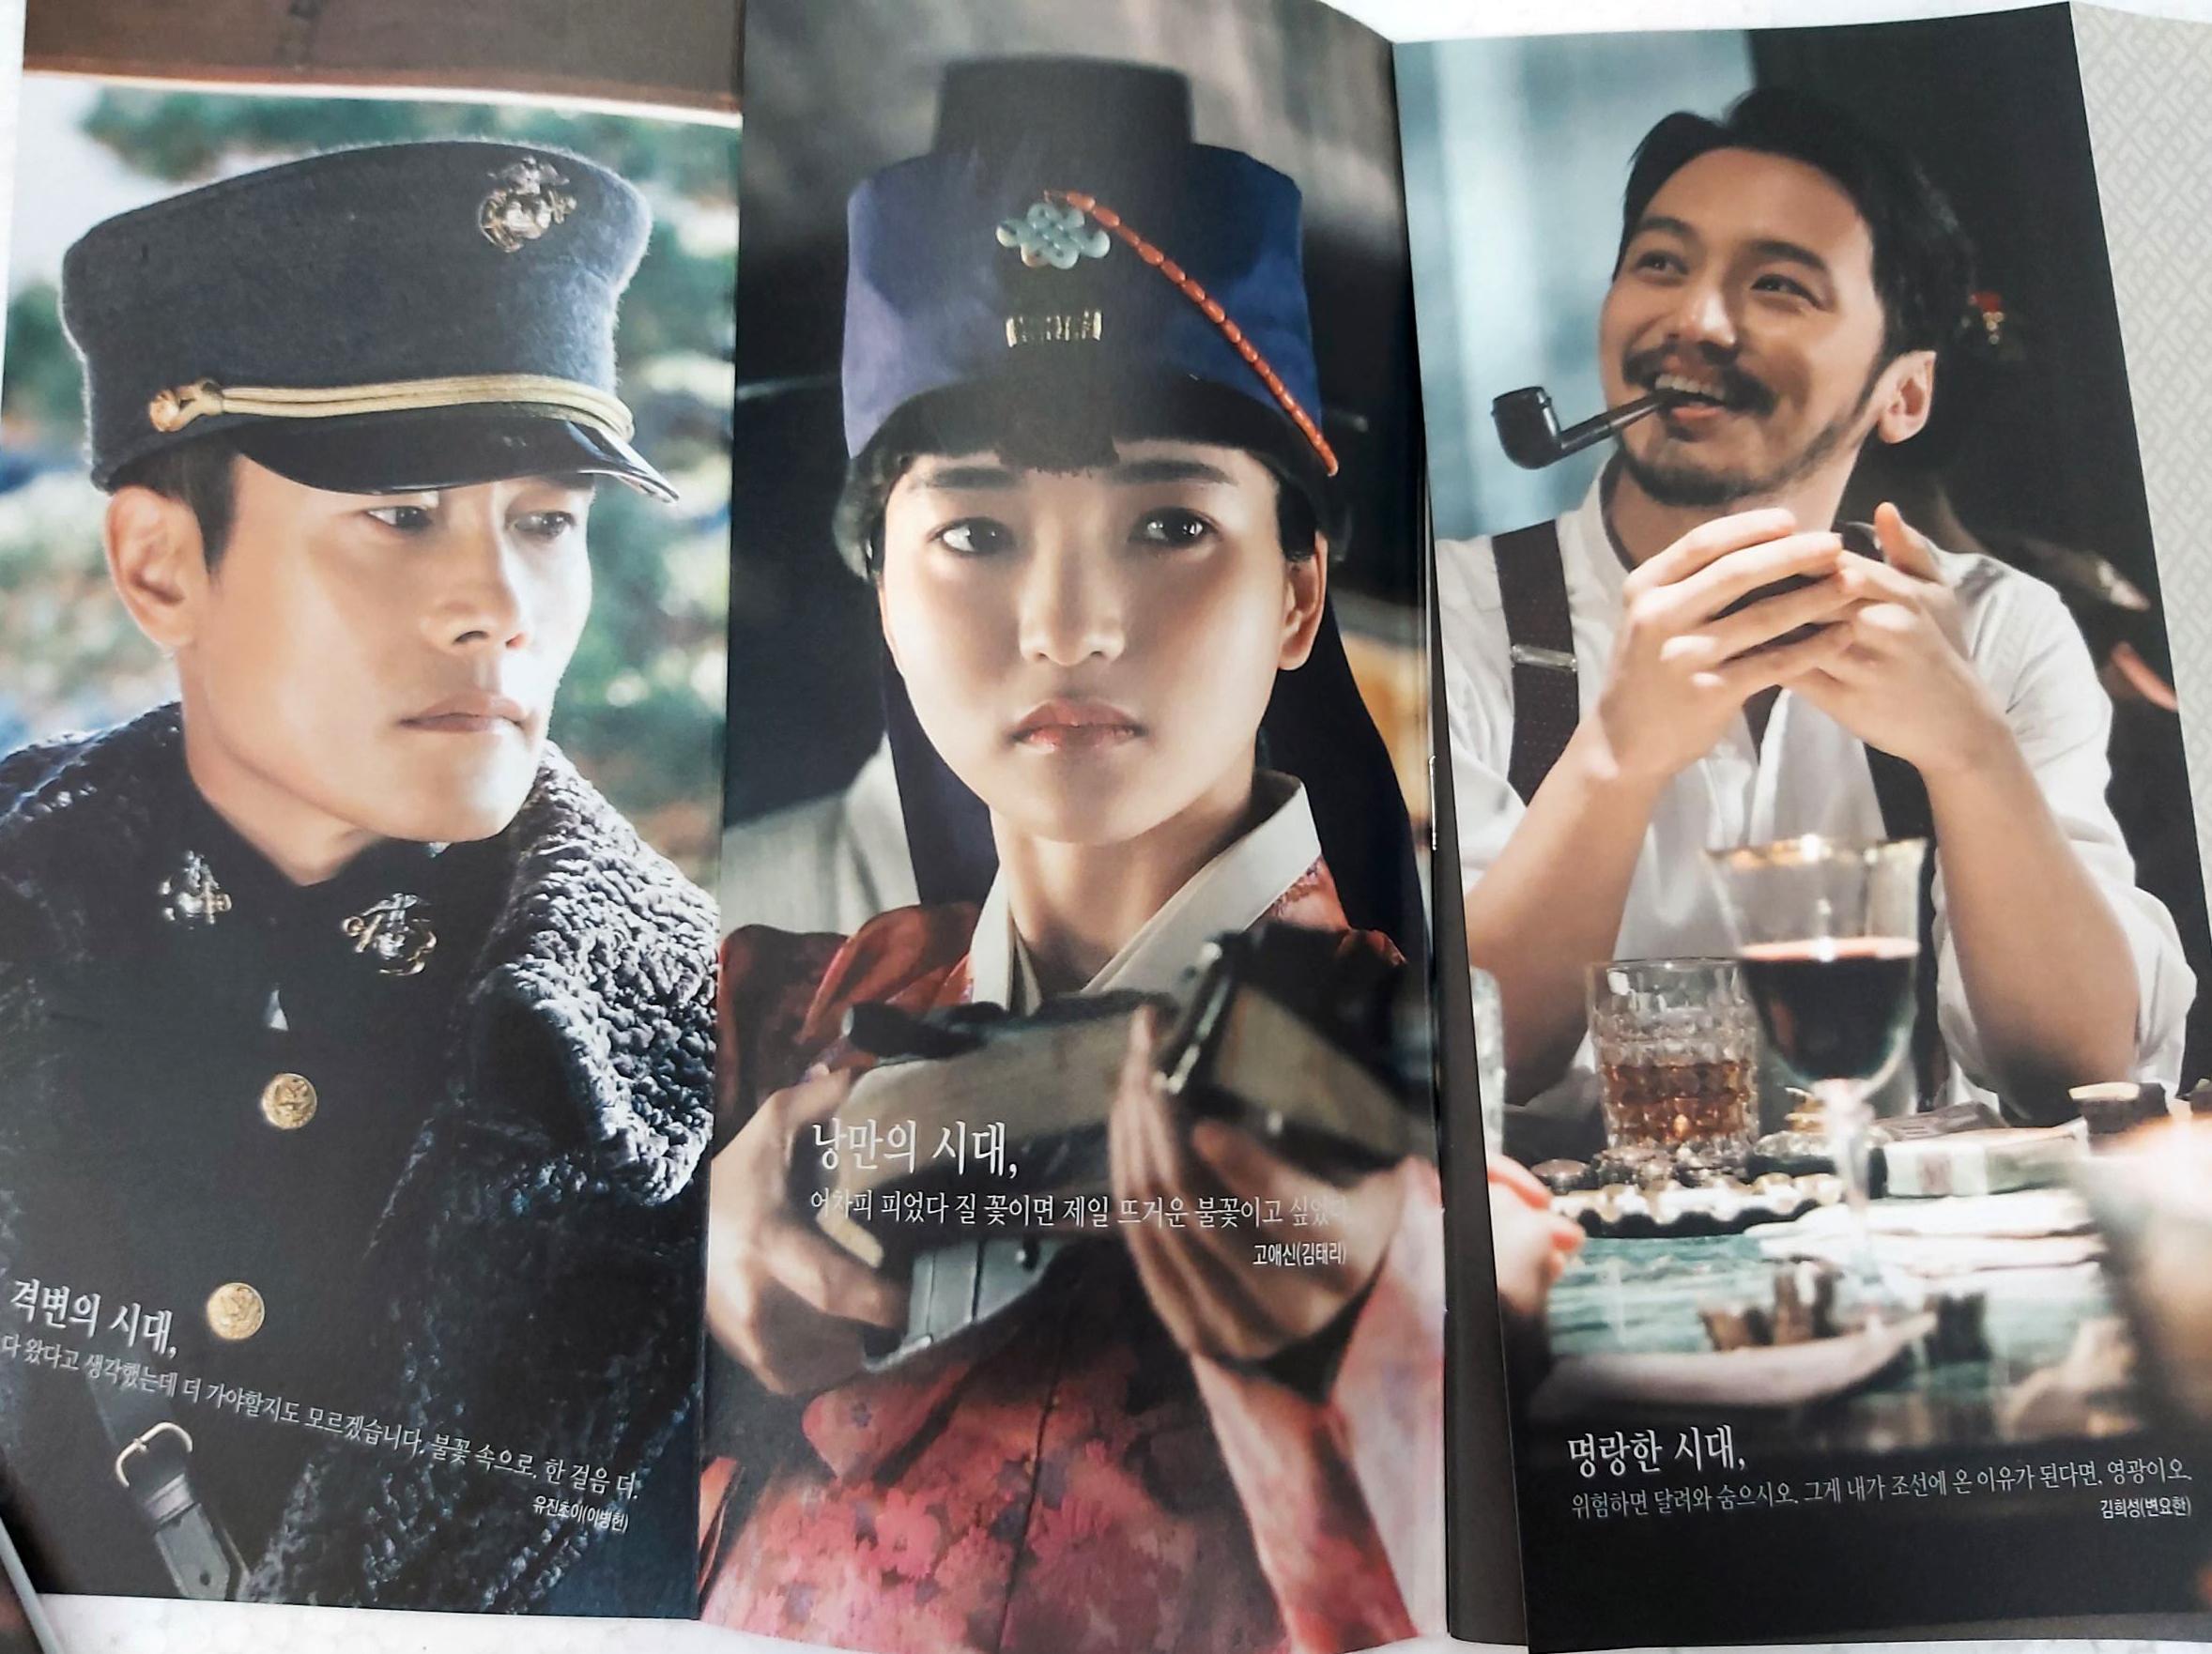 LeeByung-hun [ Mr. Sunshine Official Guide Book ] K-popKim Tae-Ri <PennyKorea>李炳宪 金泰梨 [ 阳光先生 官方旅游指南]